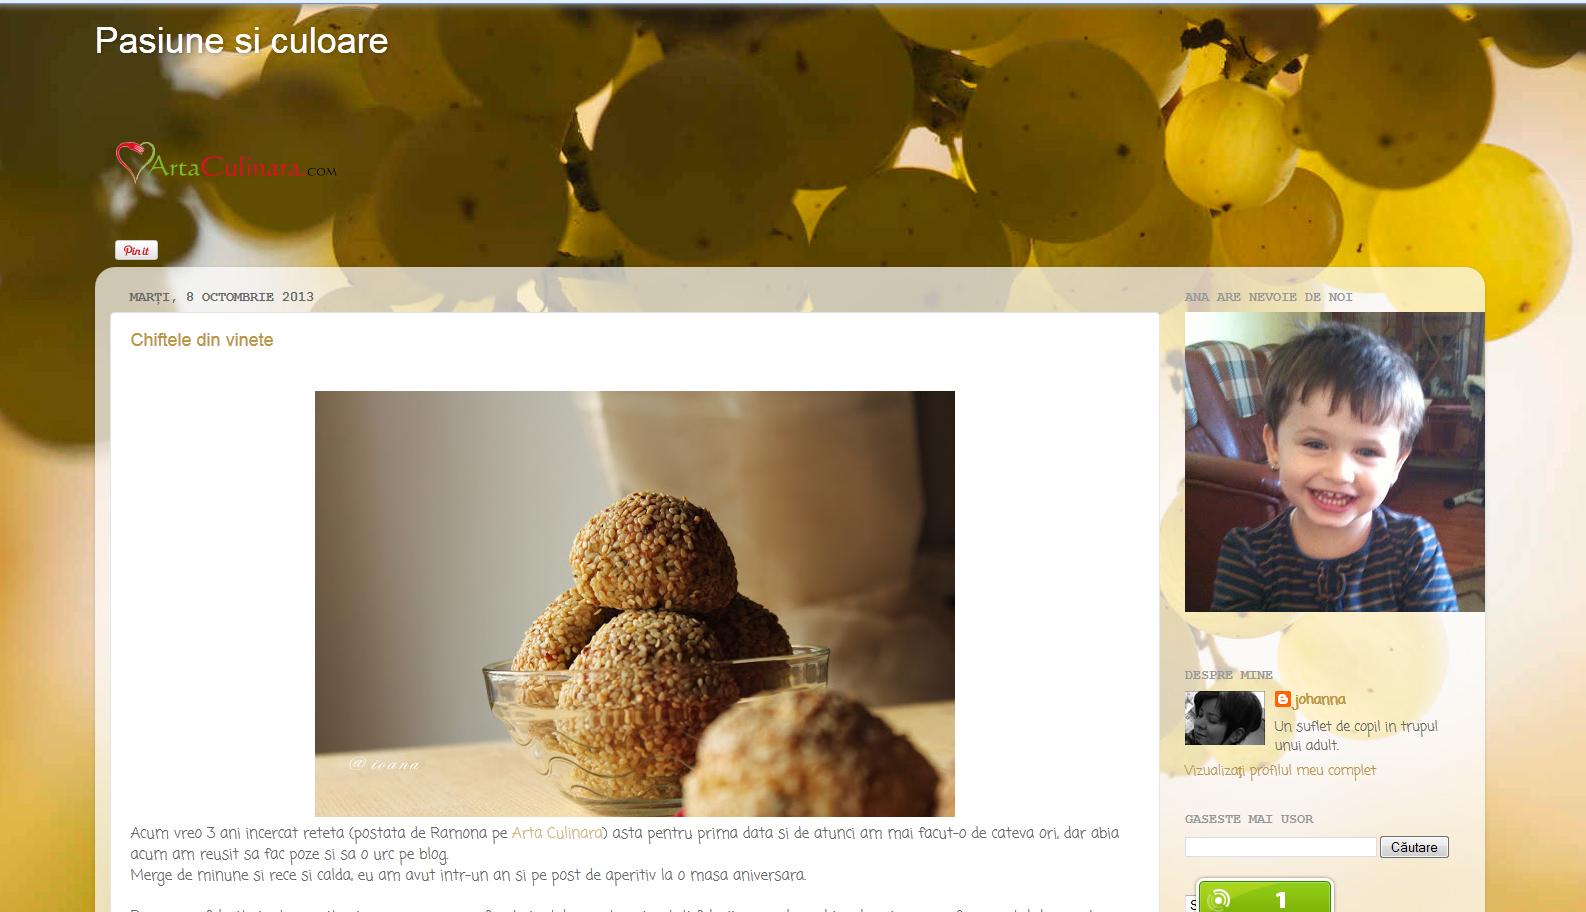 http://pasiunesiculoare.blogspot.de/